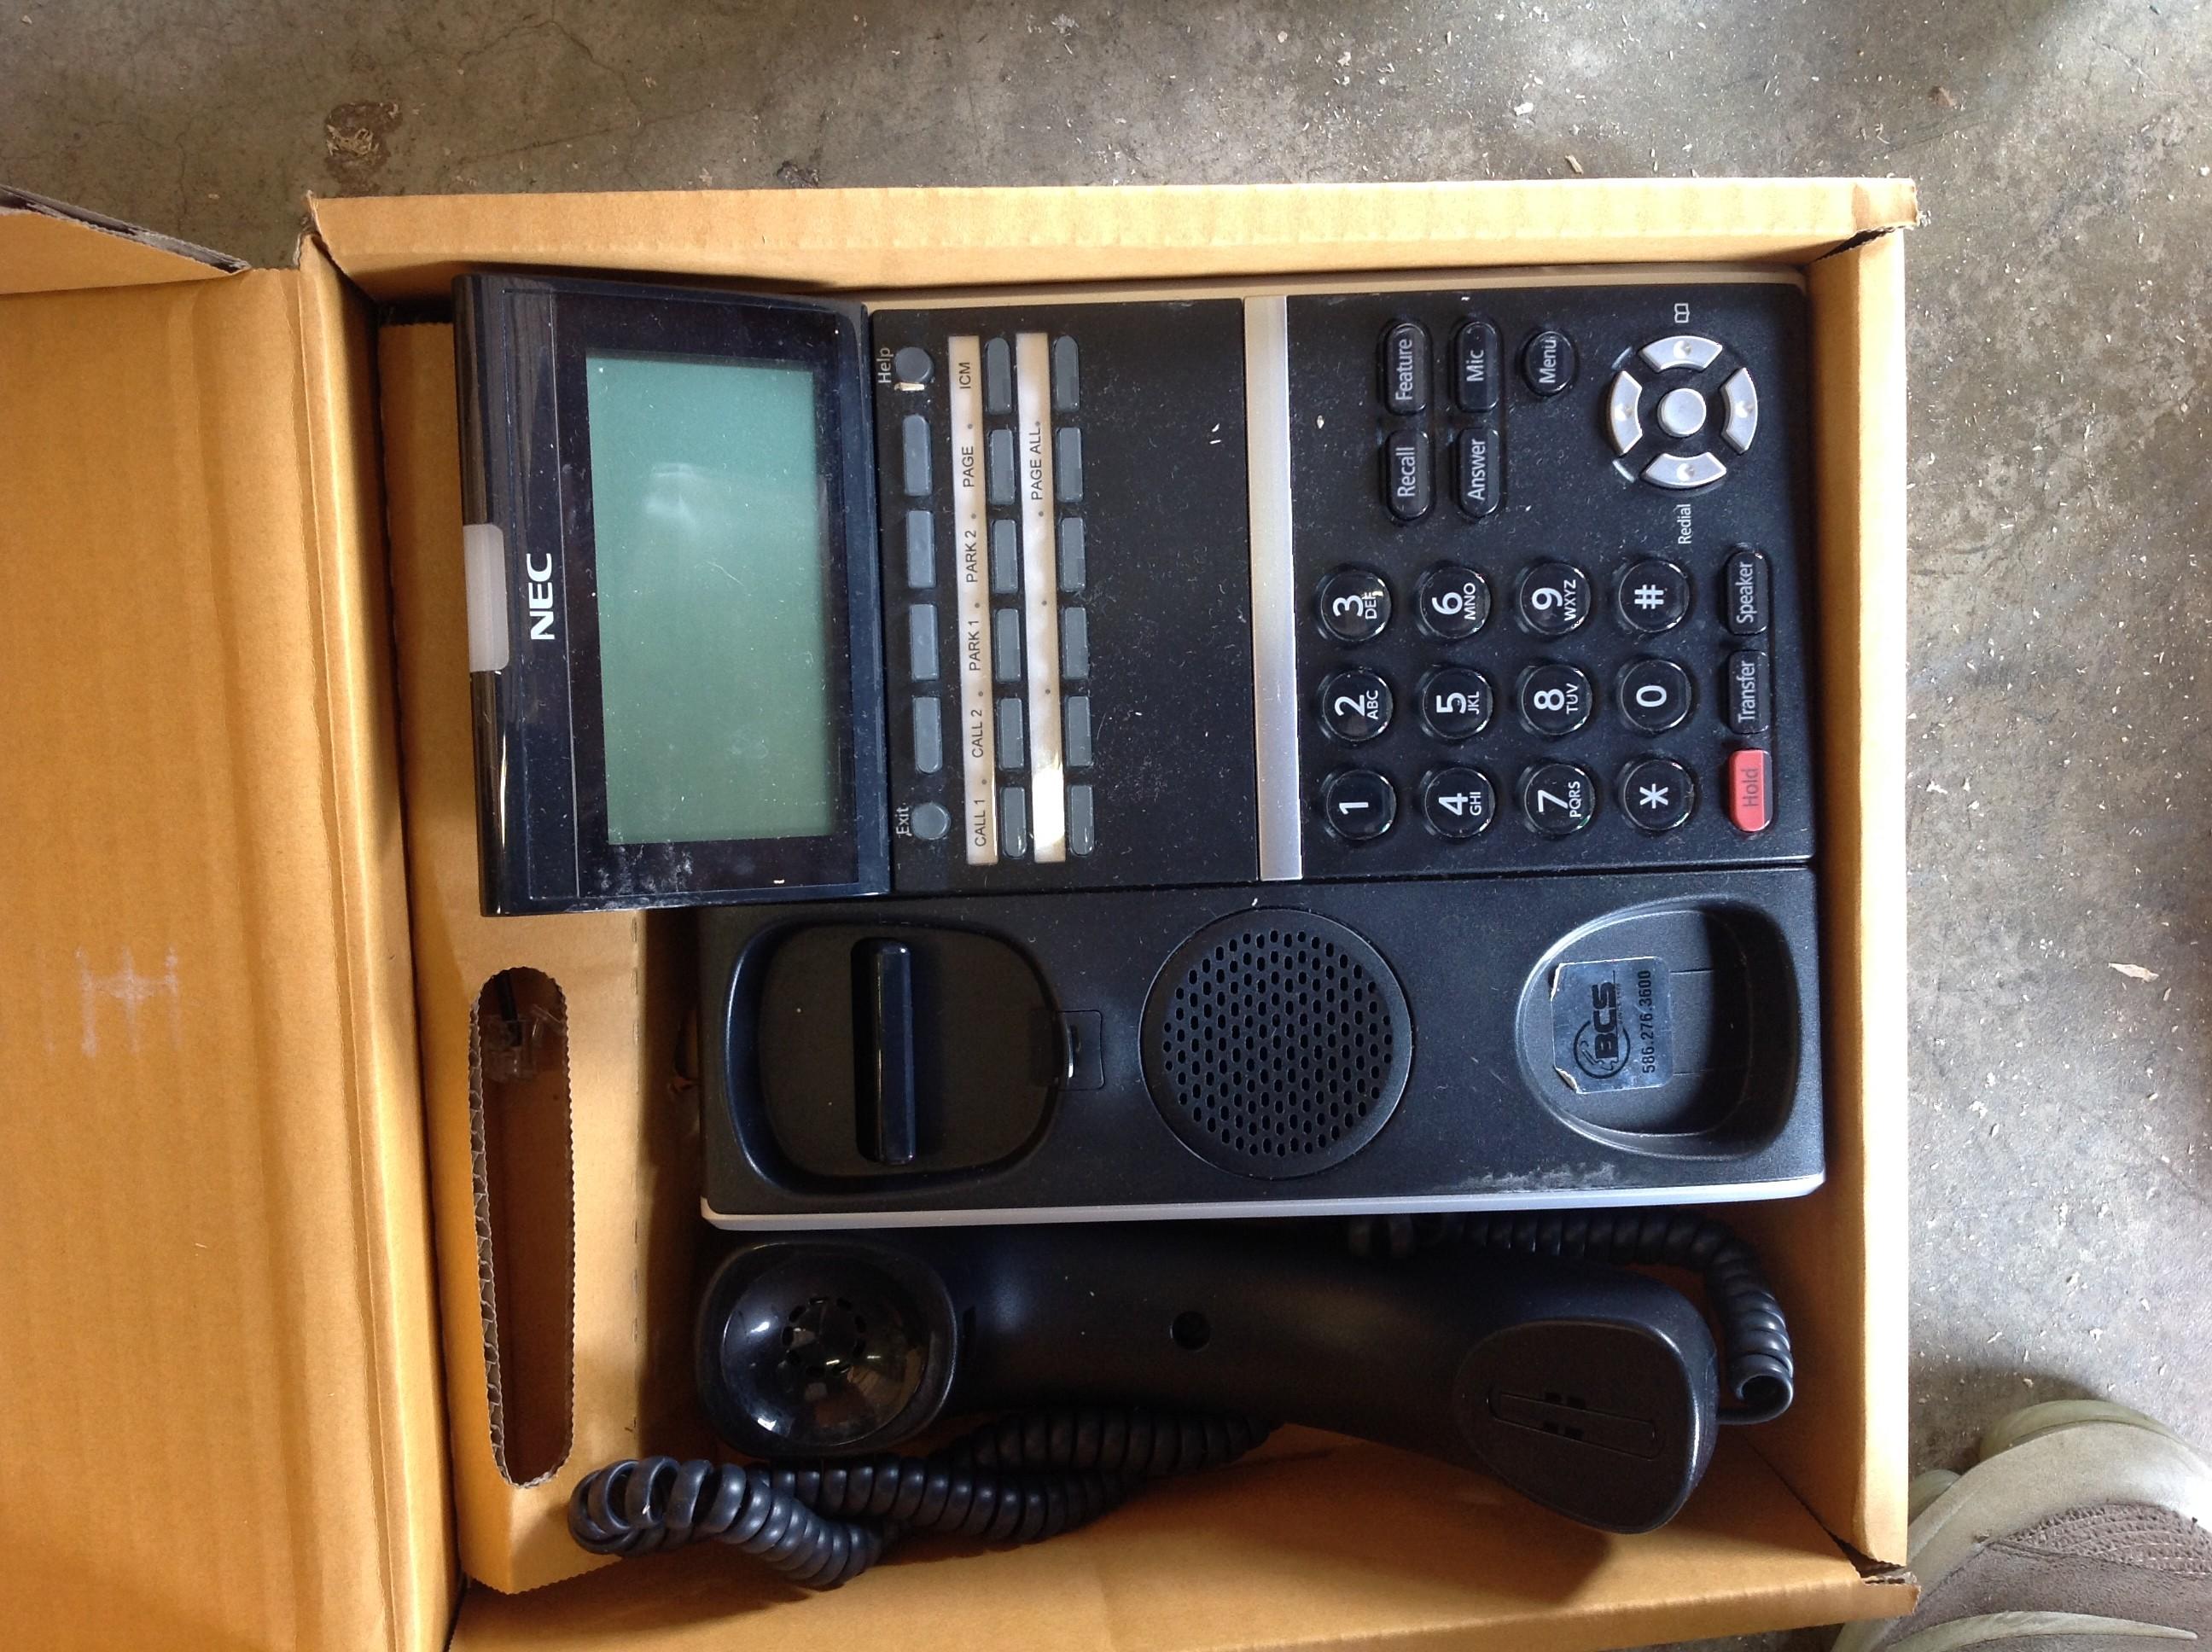 NEC DT300 TELEPHONE SYSTEM